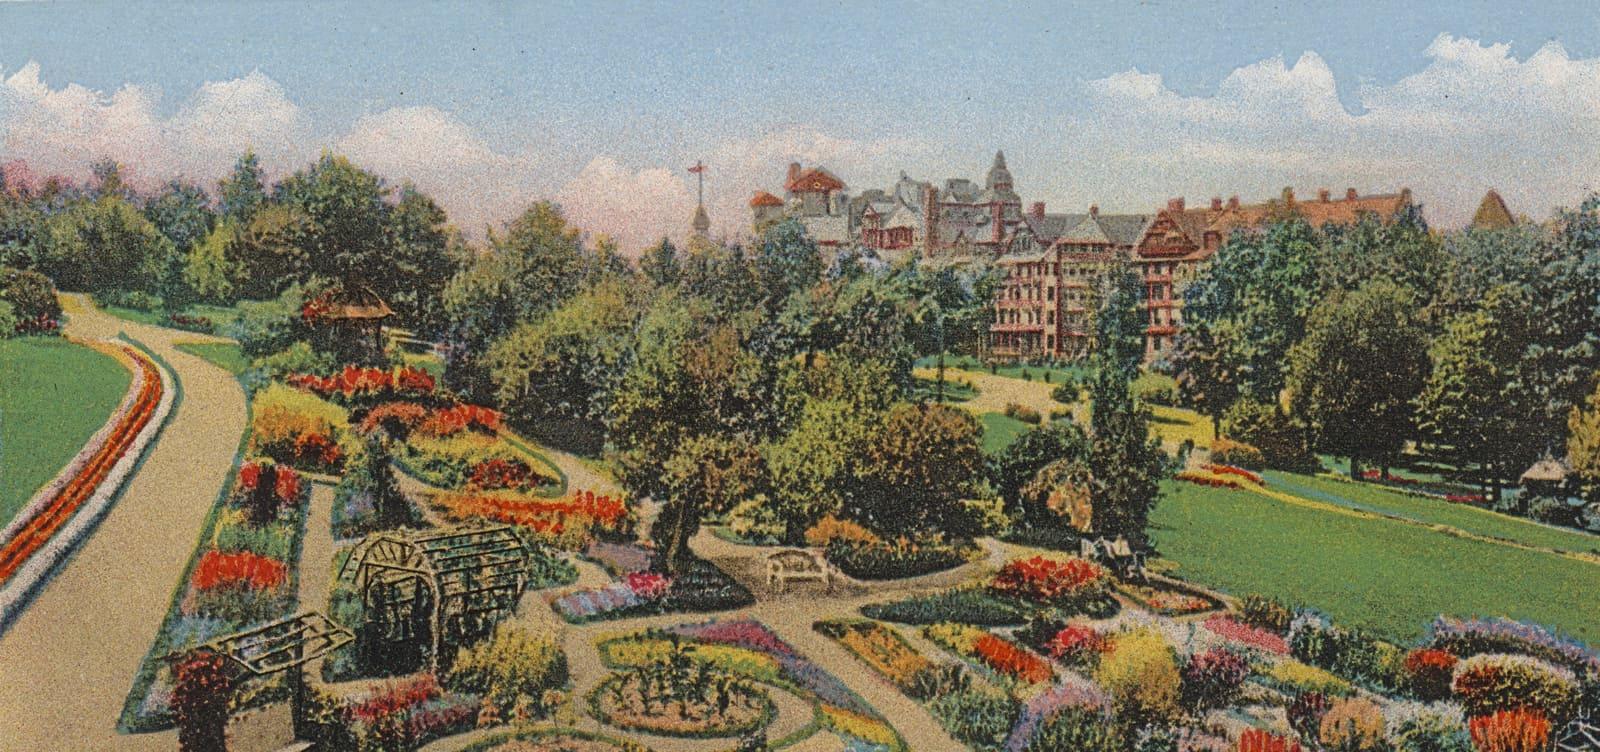 Garden-Postcard-1902_header